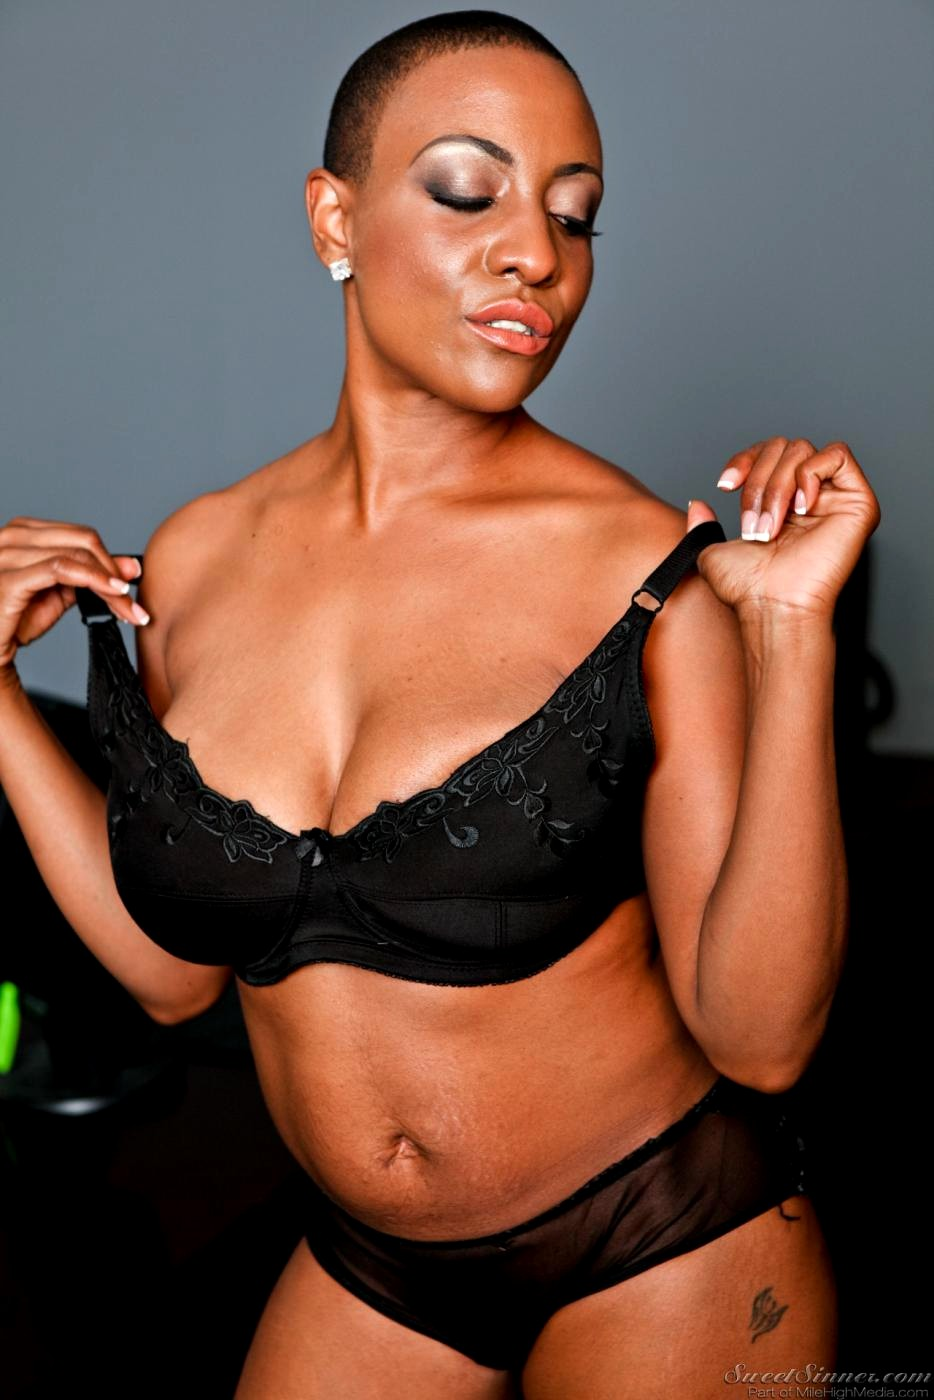 Babe Today Sweet Sinner Sincerre Lemore Recent Black Free -1139